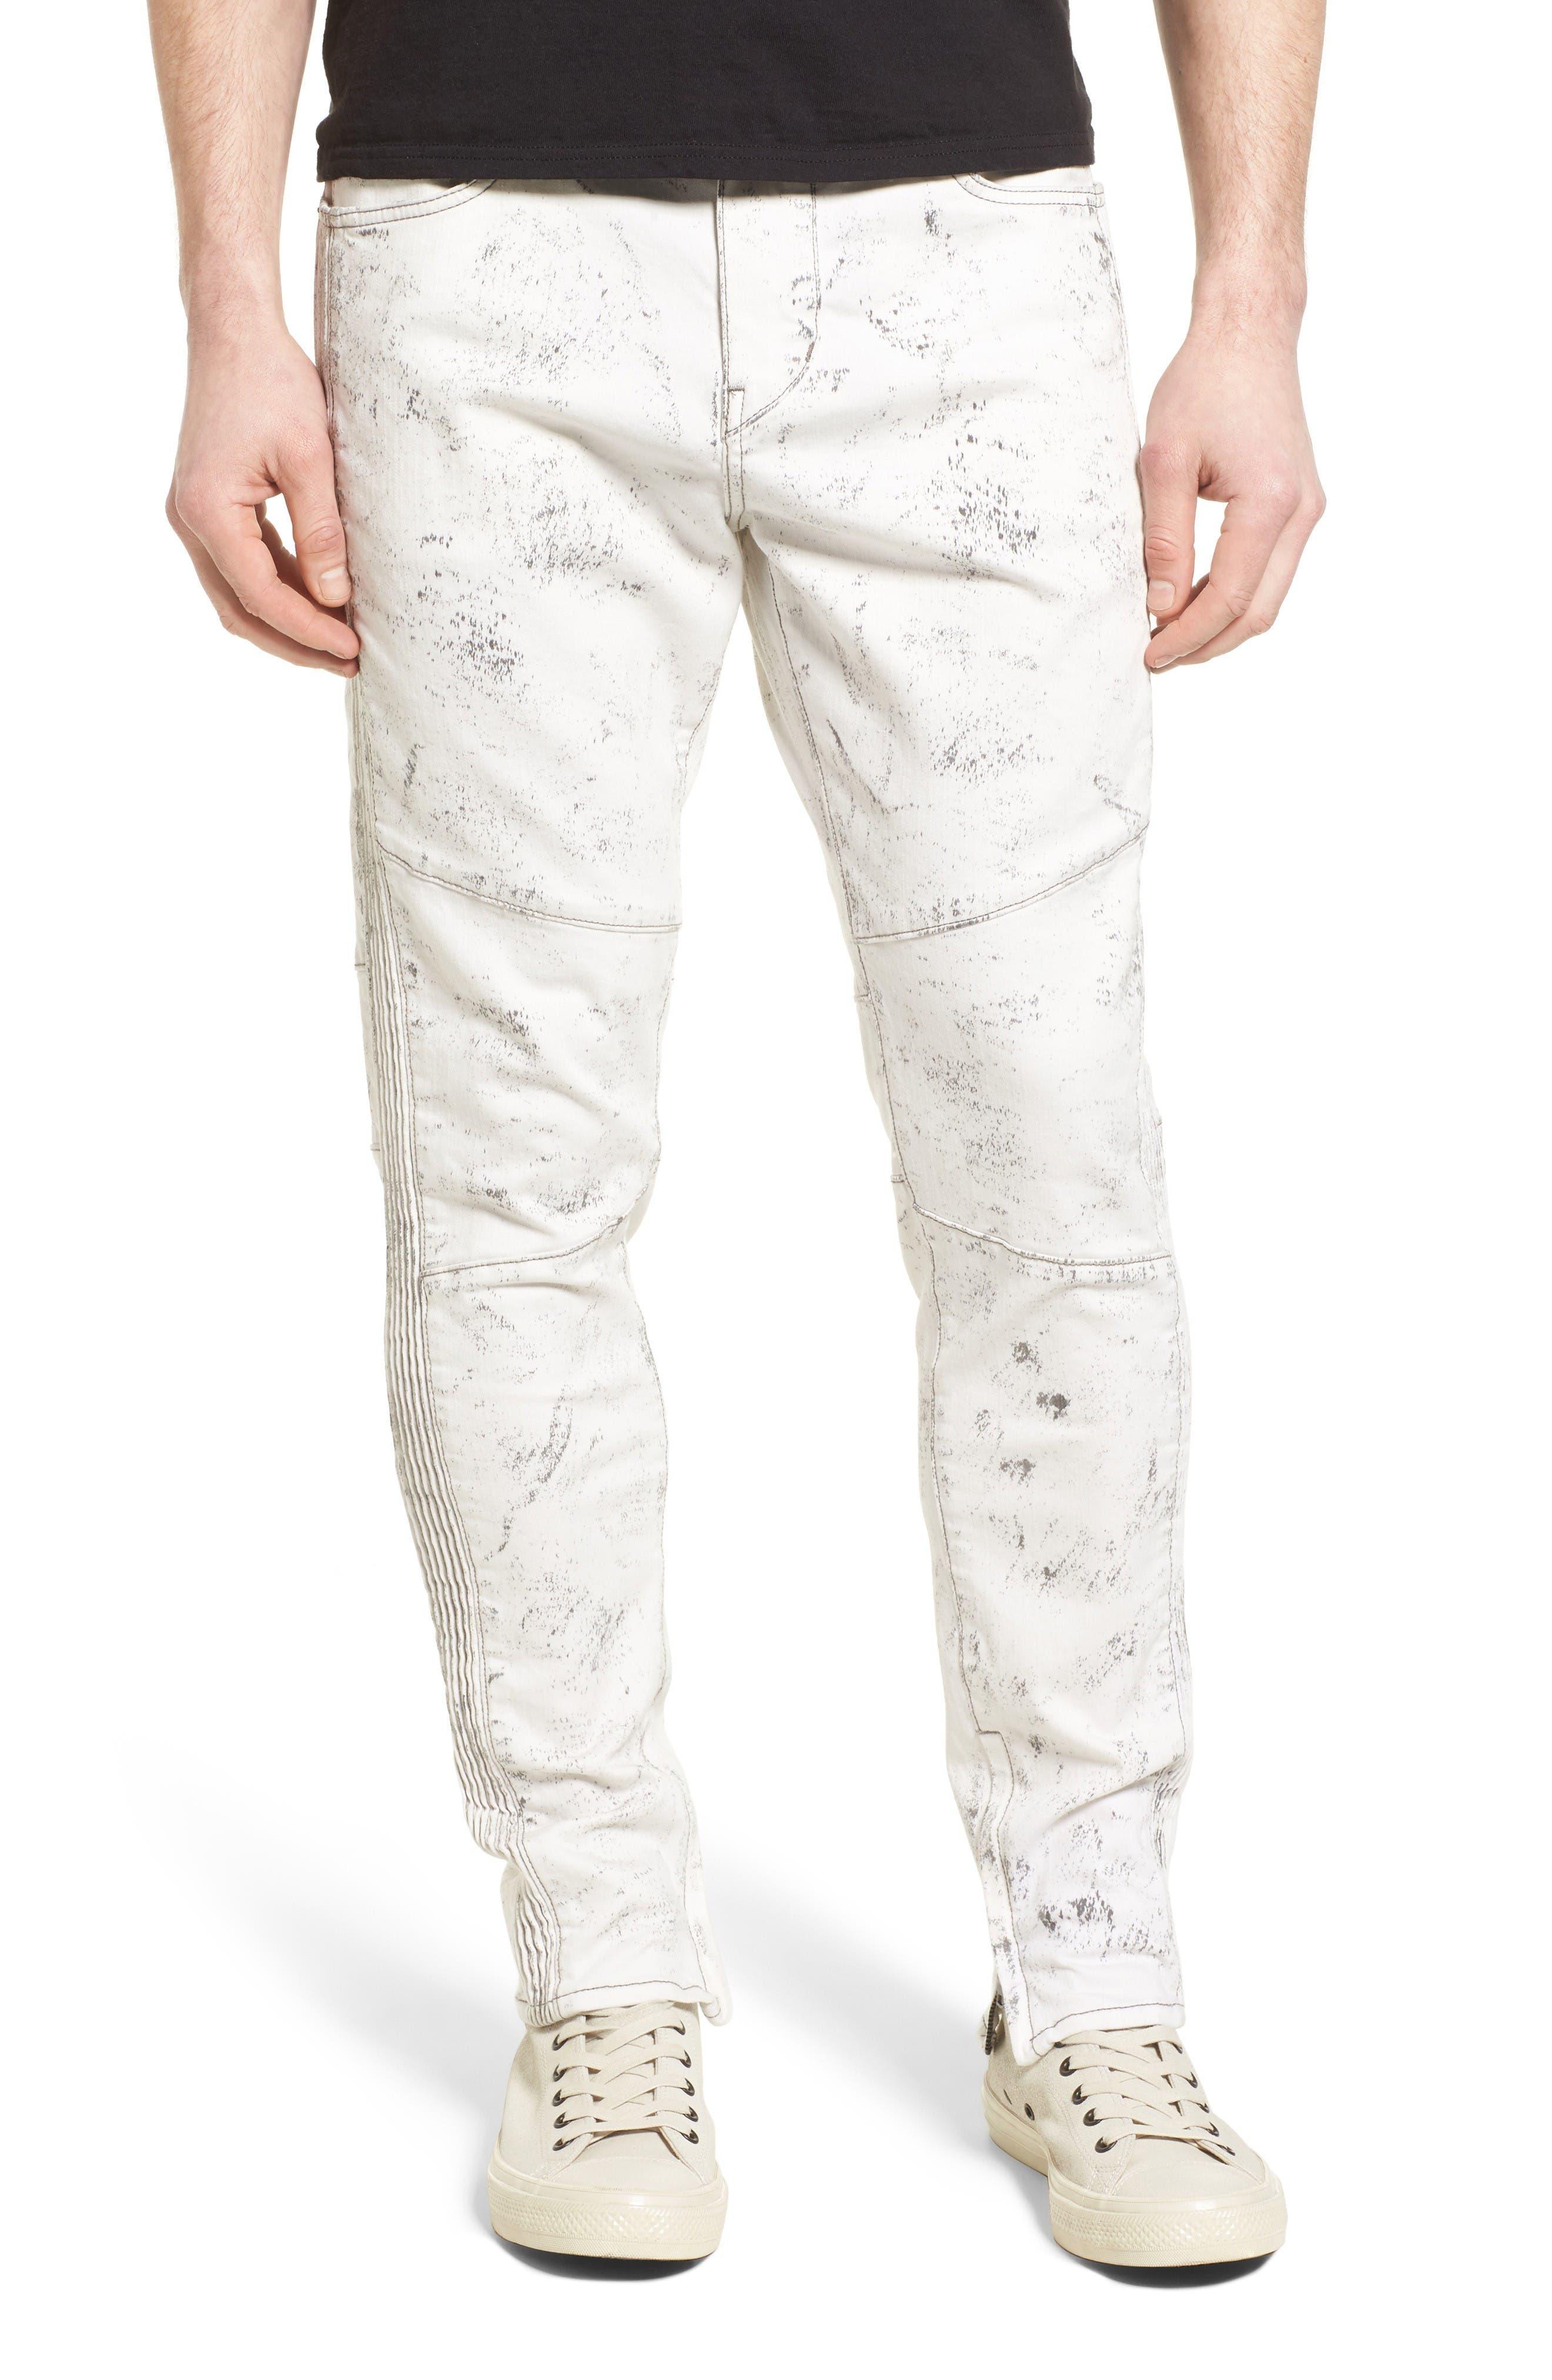 TRUE RELIGION BRAND JEANS True Religion Racer Skinny Fit Jeans